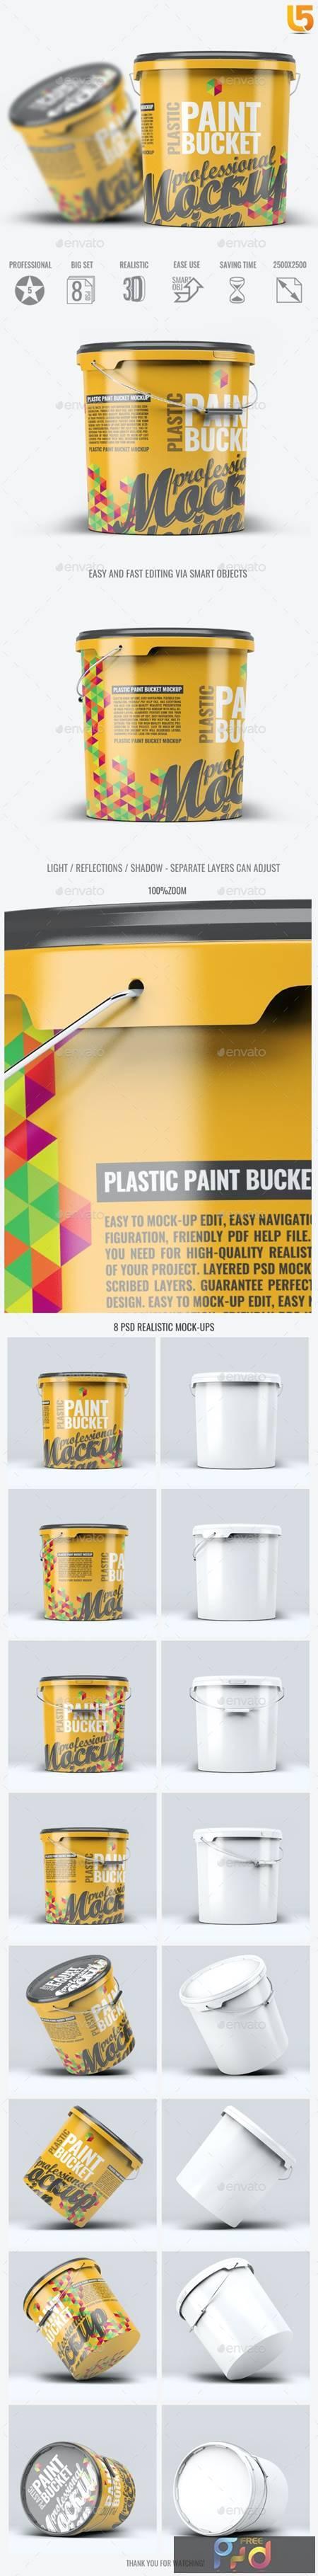 Plastic Paint Bucket Mock-Up 22858149 1